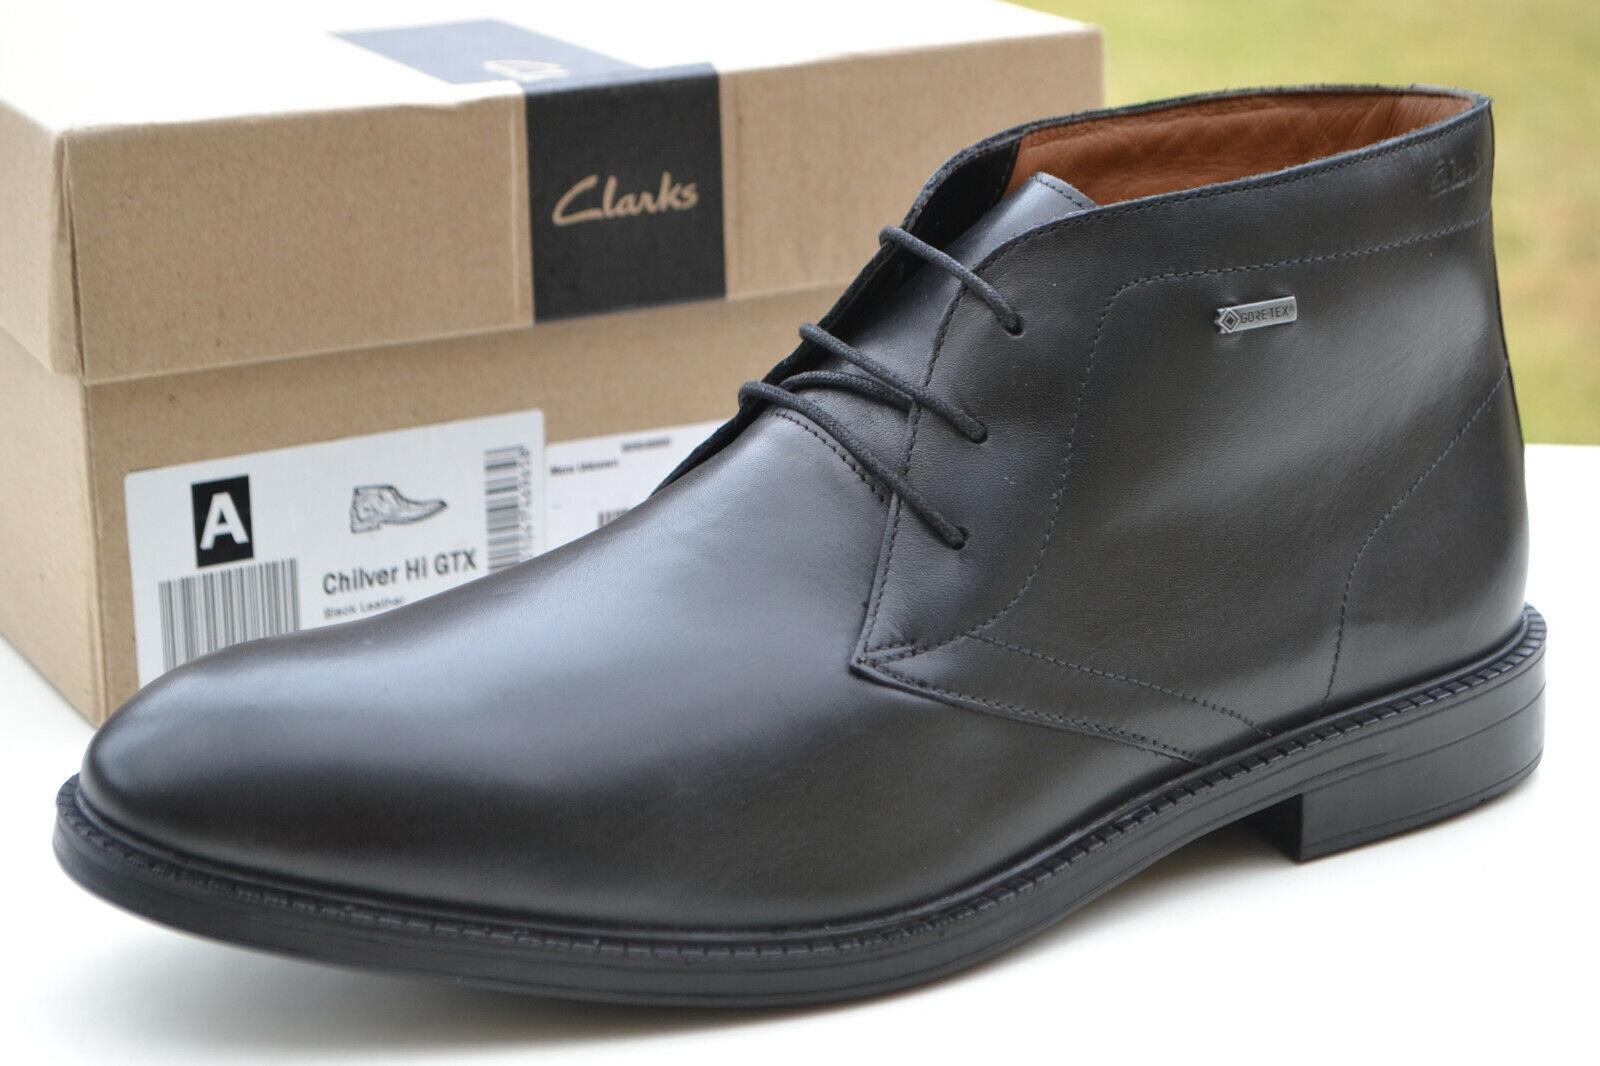 Clarks BNIB Mens Chukka Boot CHILVER HI GTX Black Leather UK 7 / 41 RRP